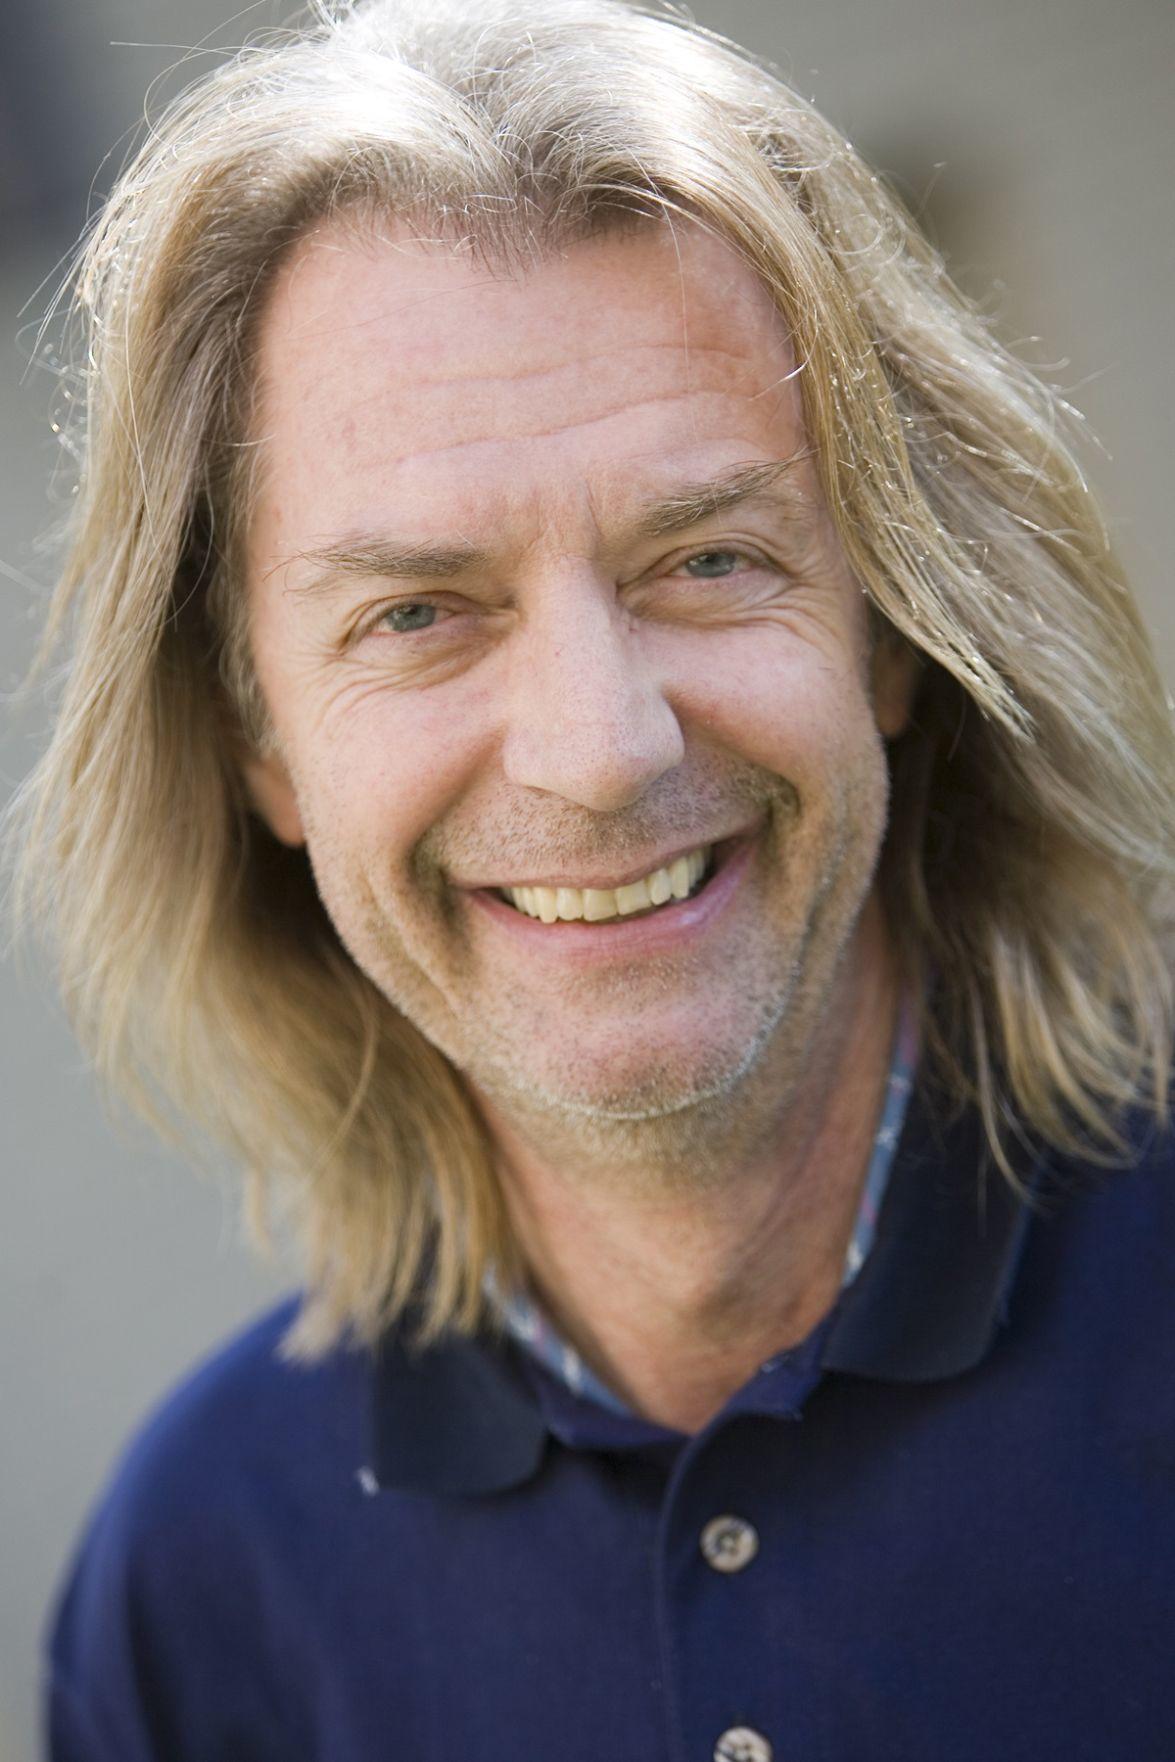 Keith Knutson